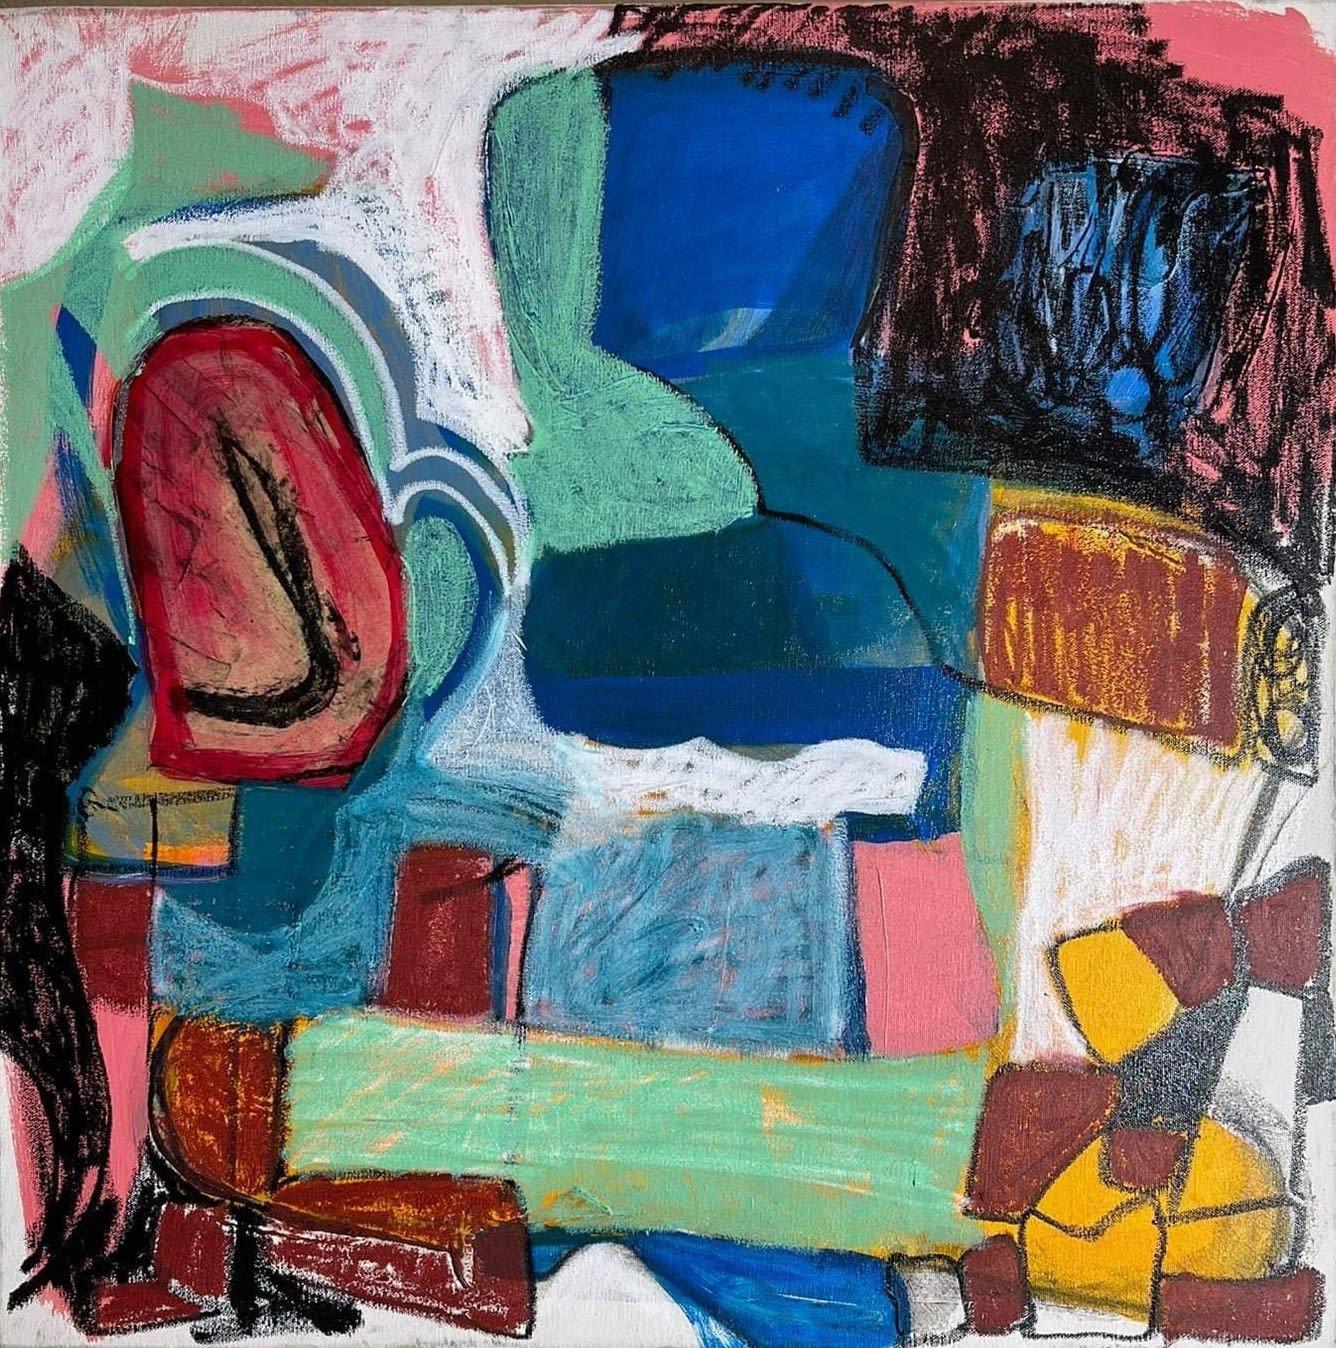 Cristina Muñiz Watchaté, 2021 Painted paper, Sakura marker, oil on canvas 24 x 24 in 61 x 61 cm